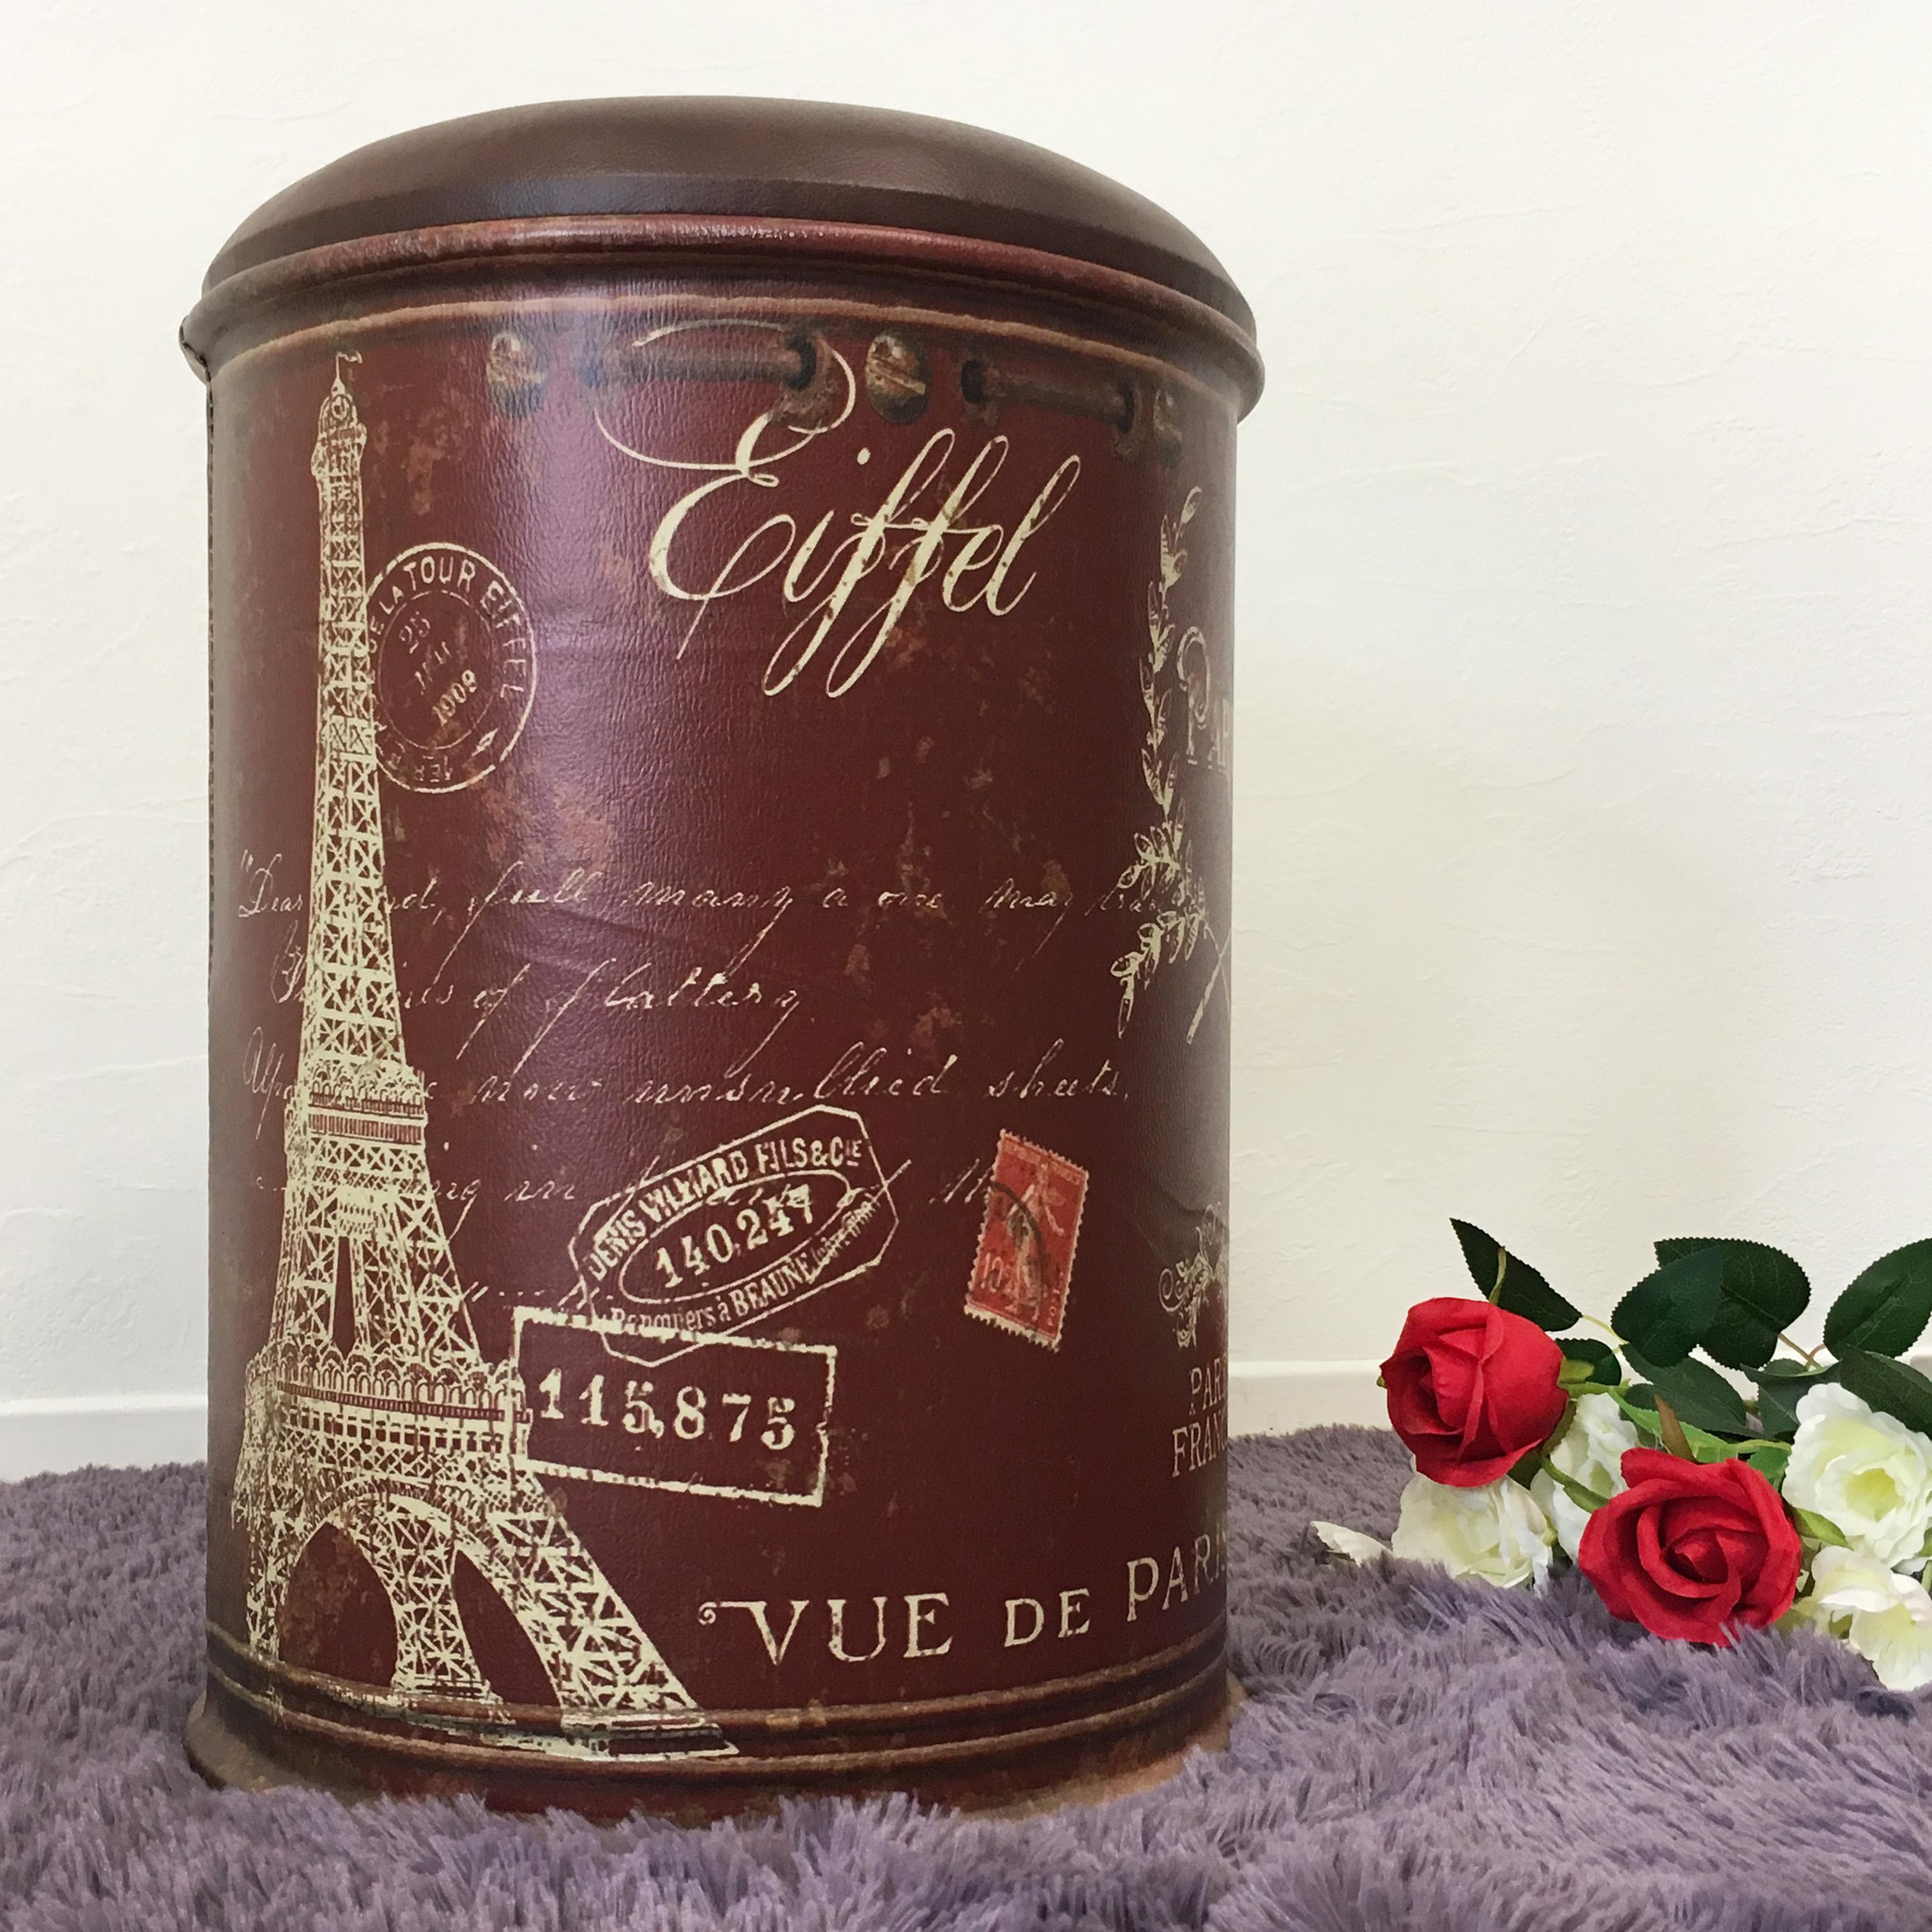 《9 ball》巴黎鐵塔 咖啡 圓筒椅 工業風 穿鞋椅 收納椅 收納凳 汽油桶 鐵桶 美式 酒吧 裝飾 !新生活家具! 樂天雙12